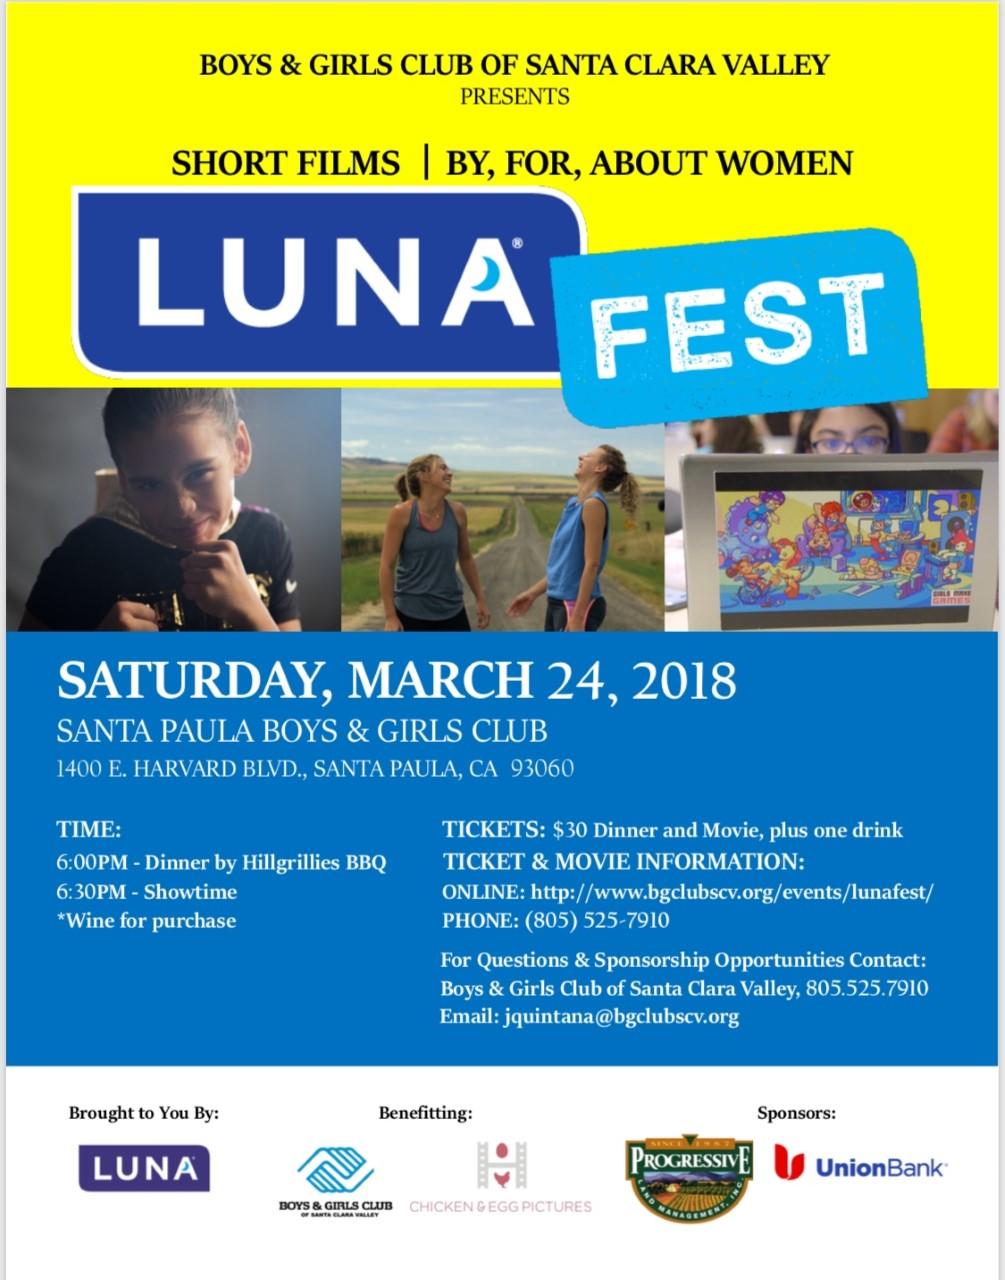 una Fest Sat March 24, 2018.jpg